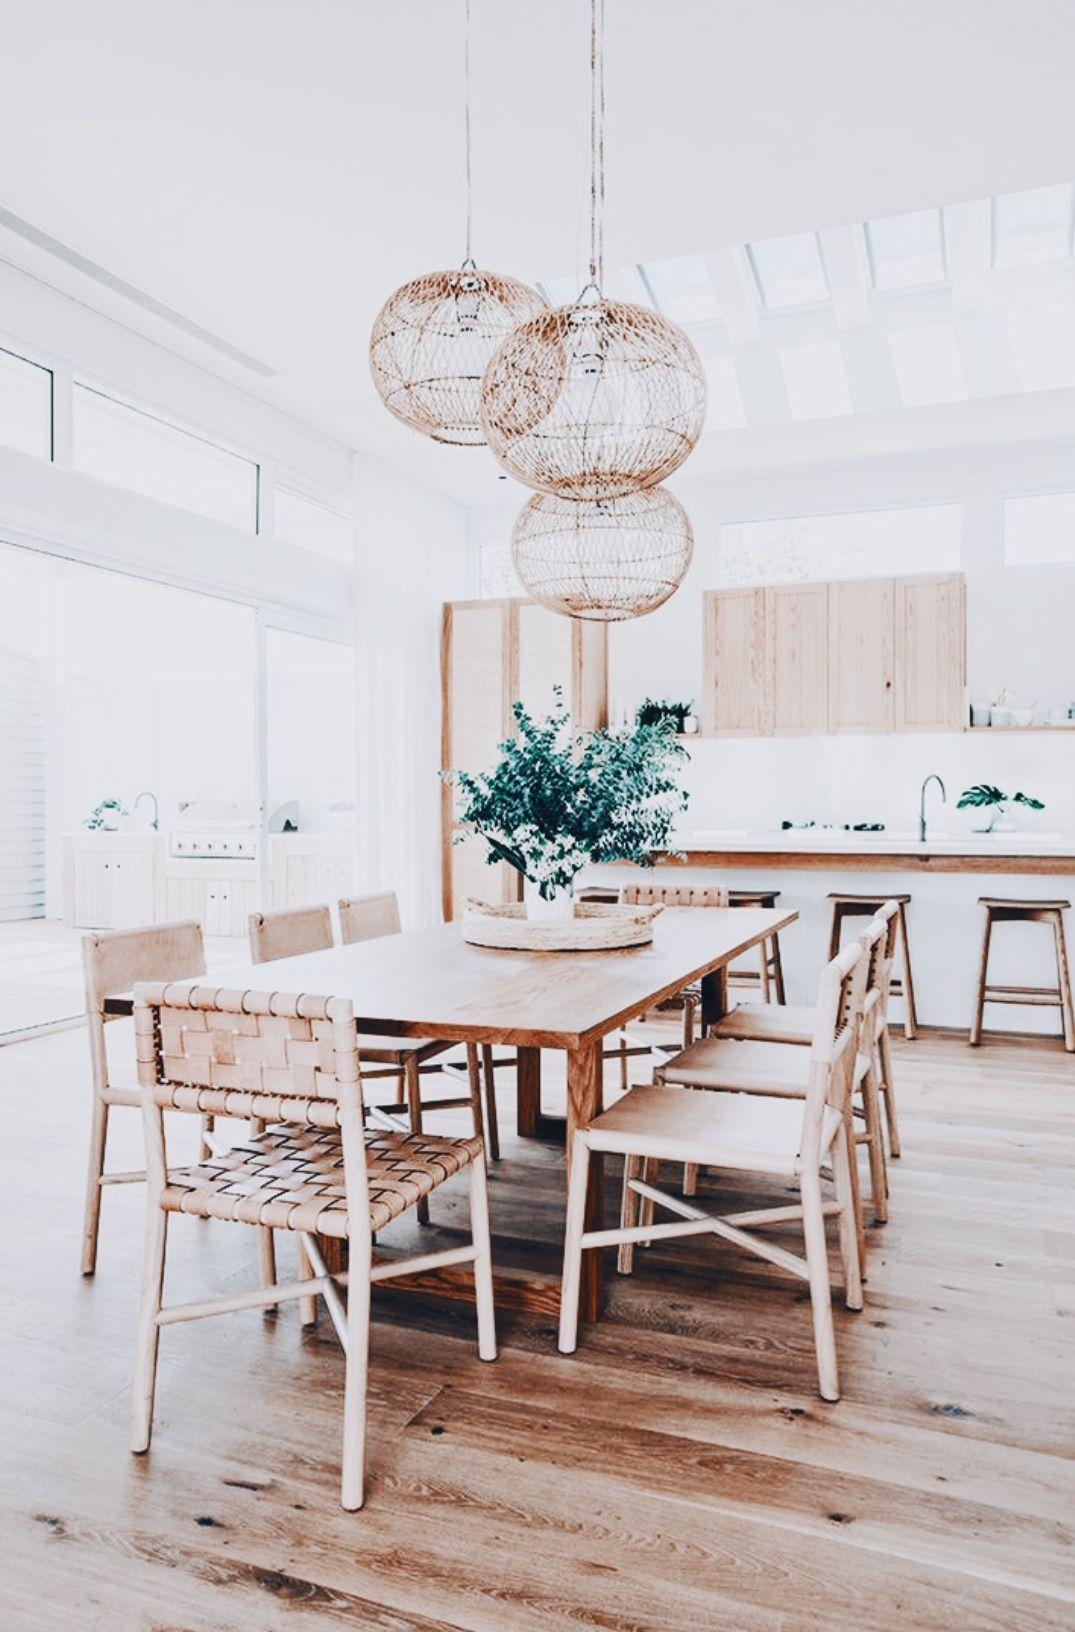 Pinterest Chandlerjocleve Instagram Chandlercleveland Scandinavian Dining Room Dining Room Inspiration Dining Room Decor